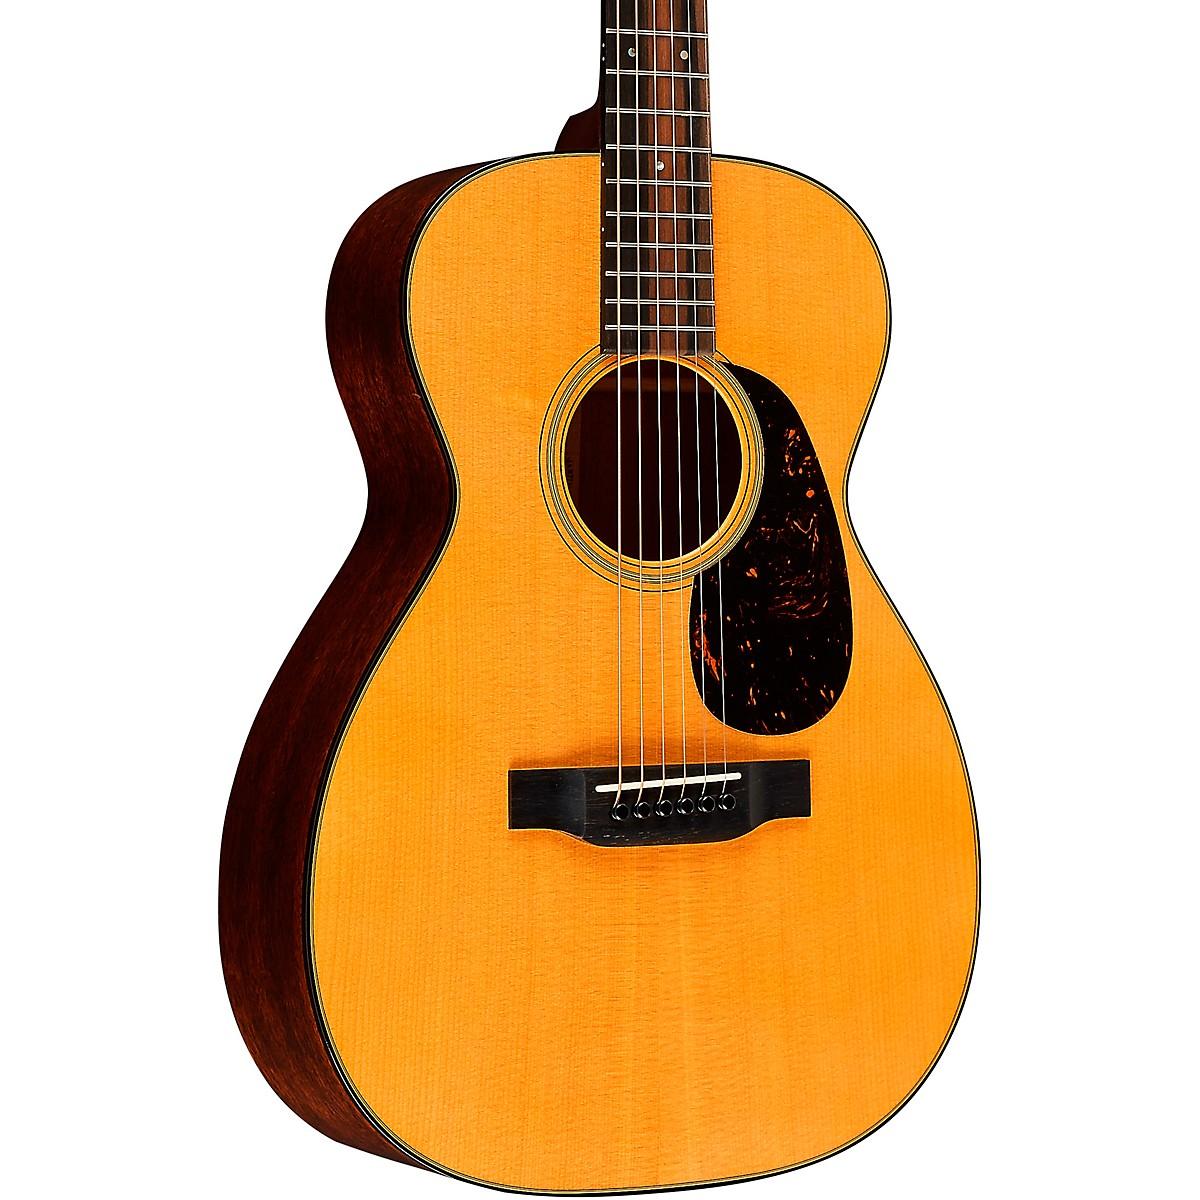 Martin Standard Series 0-18 Concert Acoustic Guitar